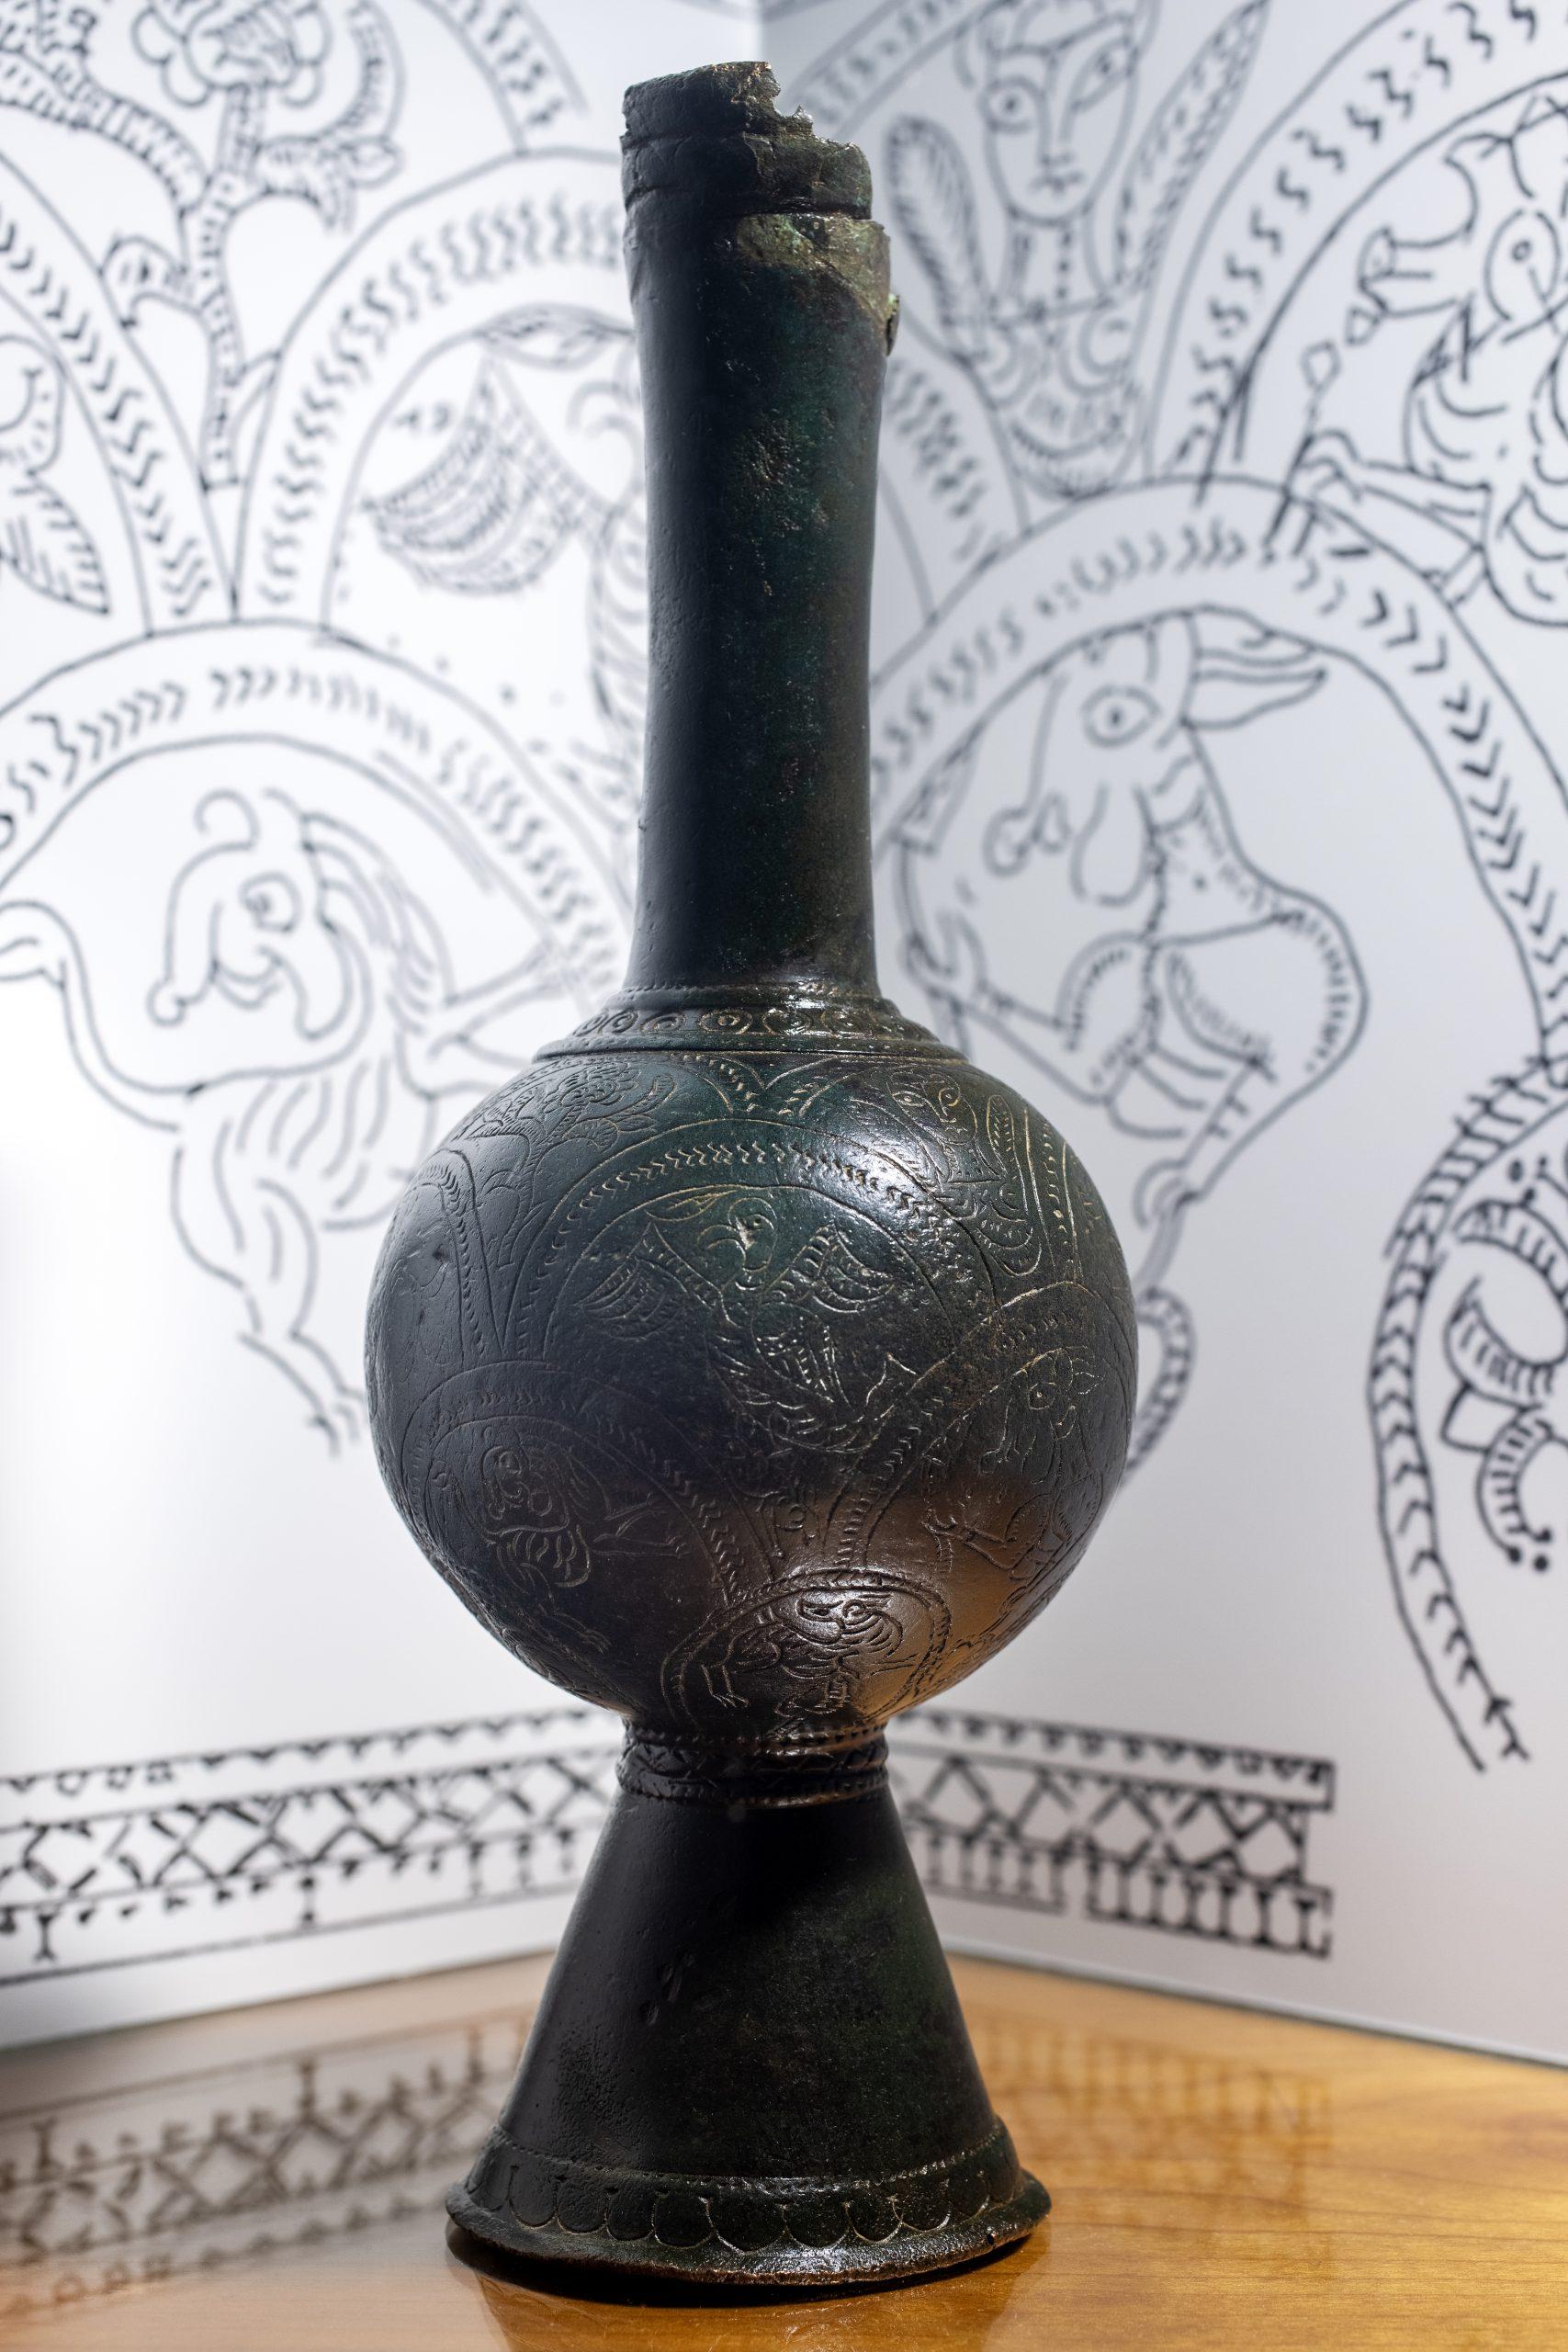 Jarro de BalbardaSan Simones, Balbarda. Mozárabe. Siglo IX. Bronce / 24 x 8 Ø cm. [IM 414] Sala VI.